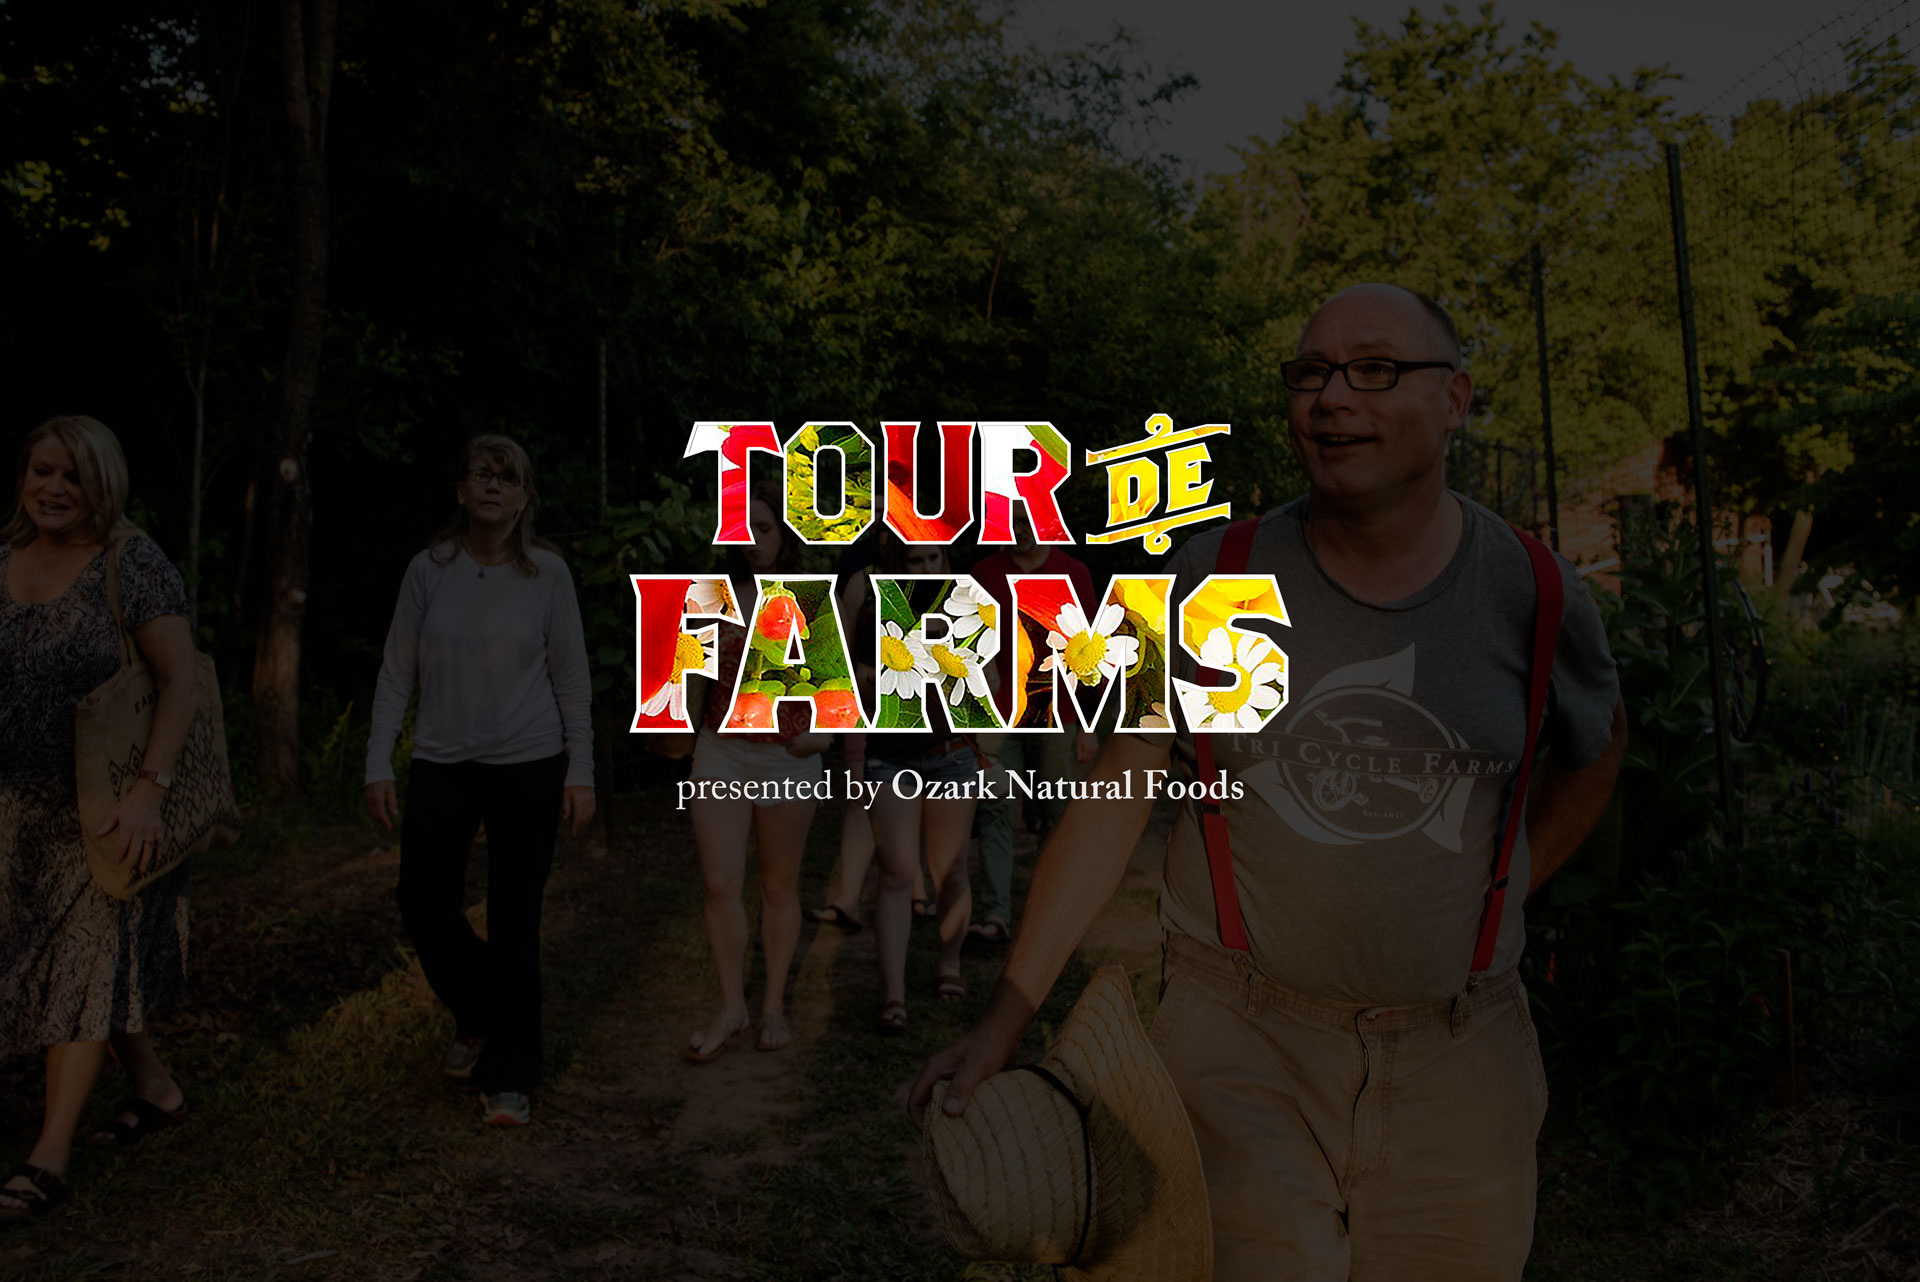 Tour_De_Farms_TriCycle_Final_Mockup_v2.0.jpg